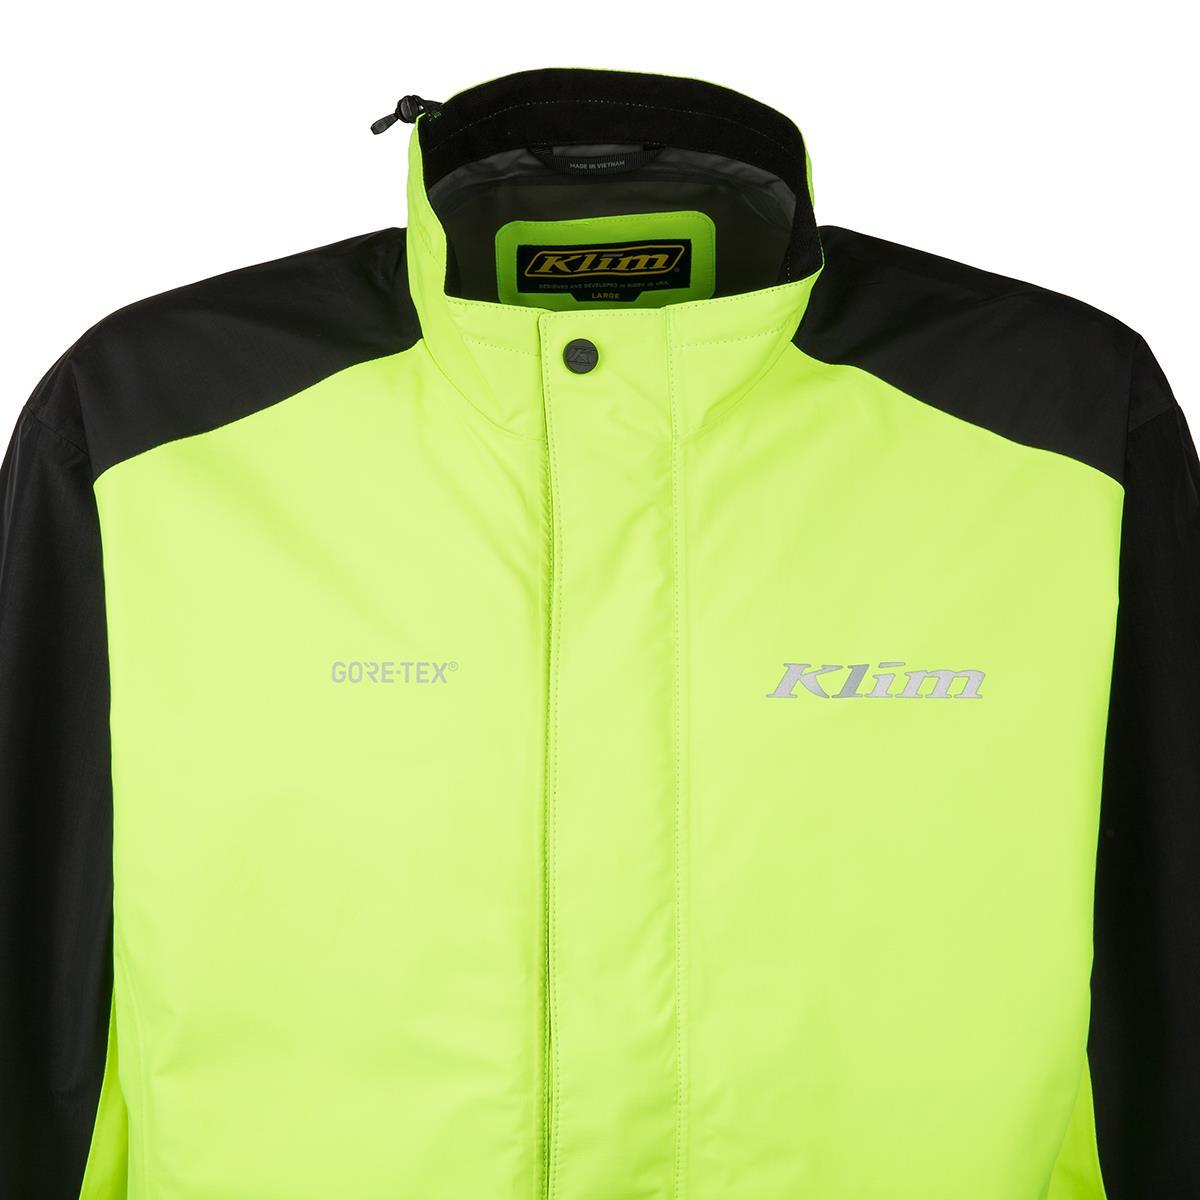 e98157db9 Klim Jacket Forecast Yellow/Black